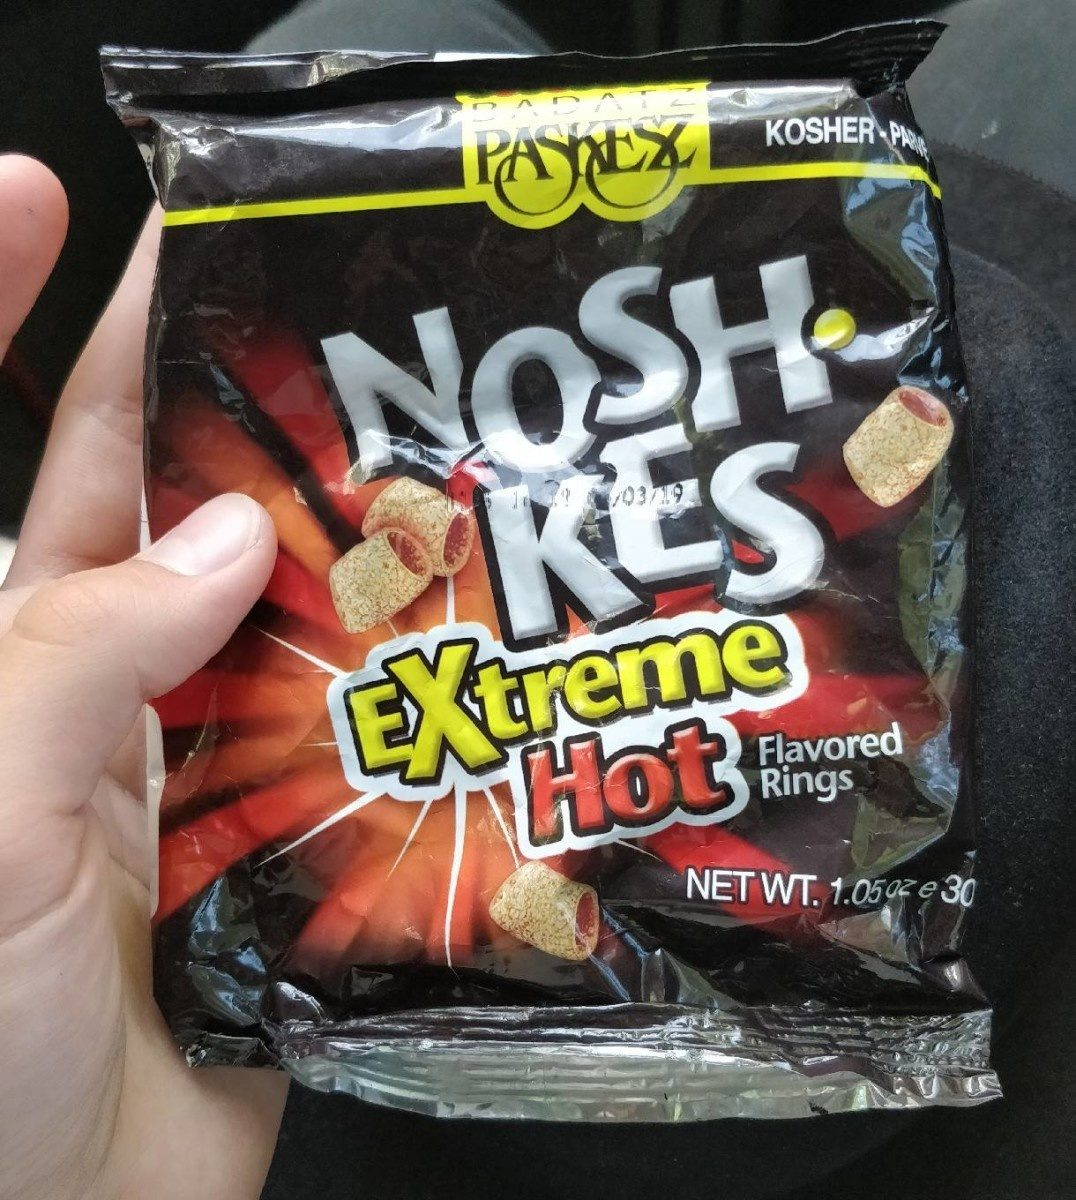 Nosh-kes rings - Product - en